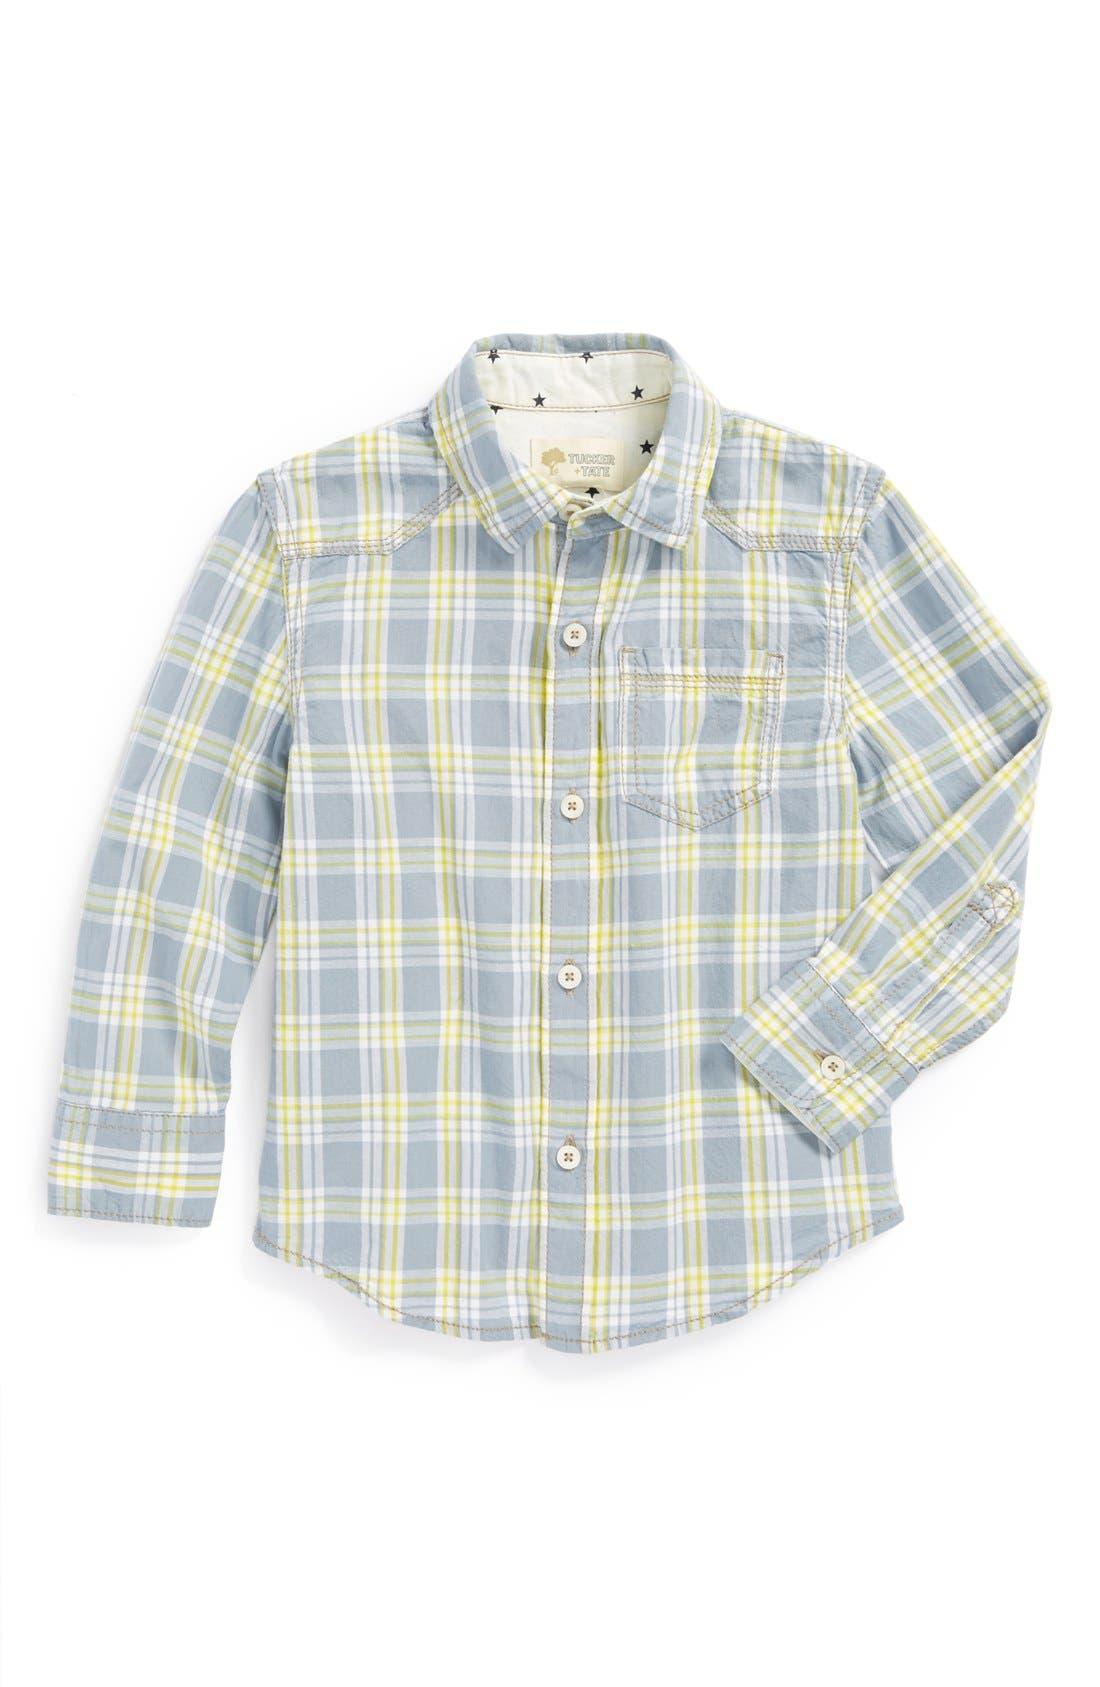 Main Image - Tucker + Tate 'Conrad' Plaid Shirt (Toddler Boys & Little Boys)